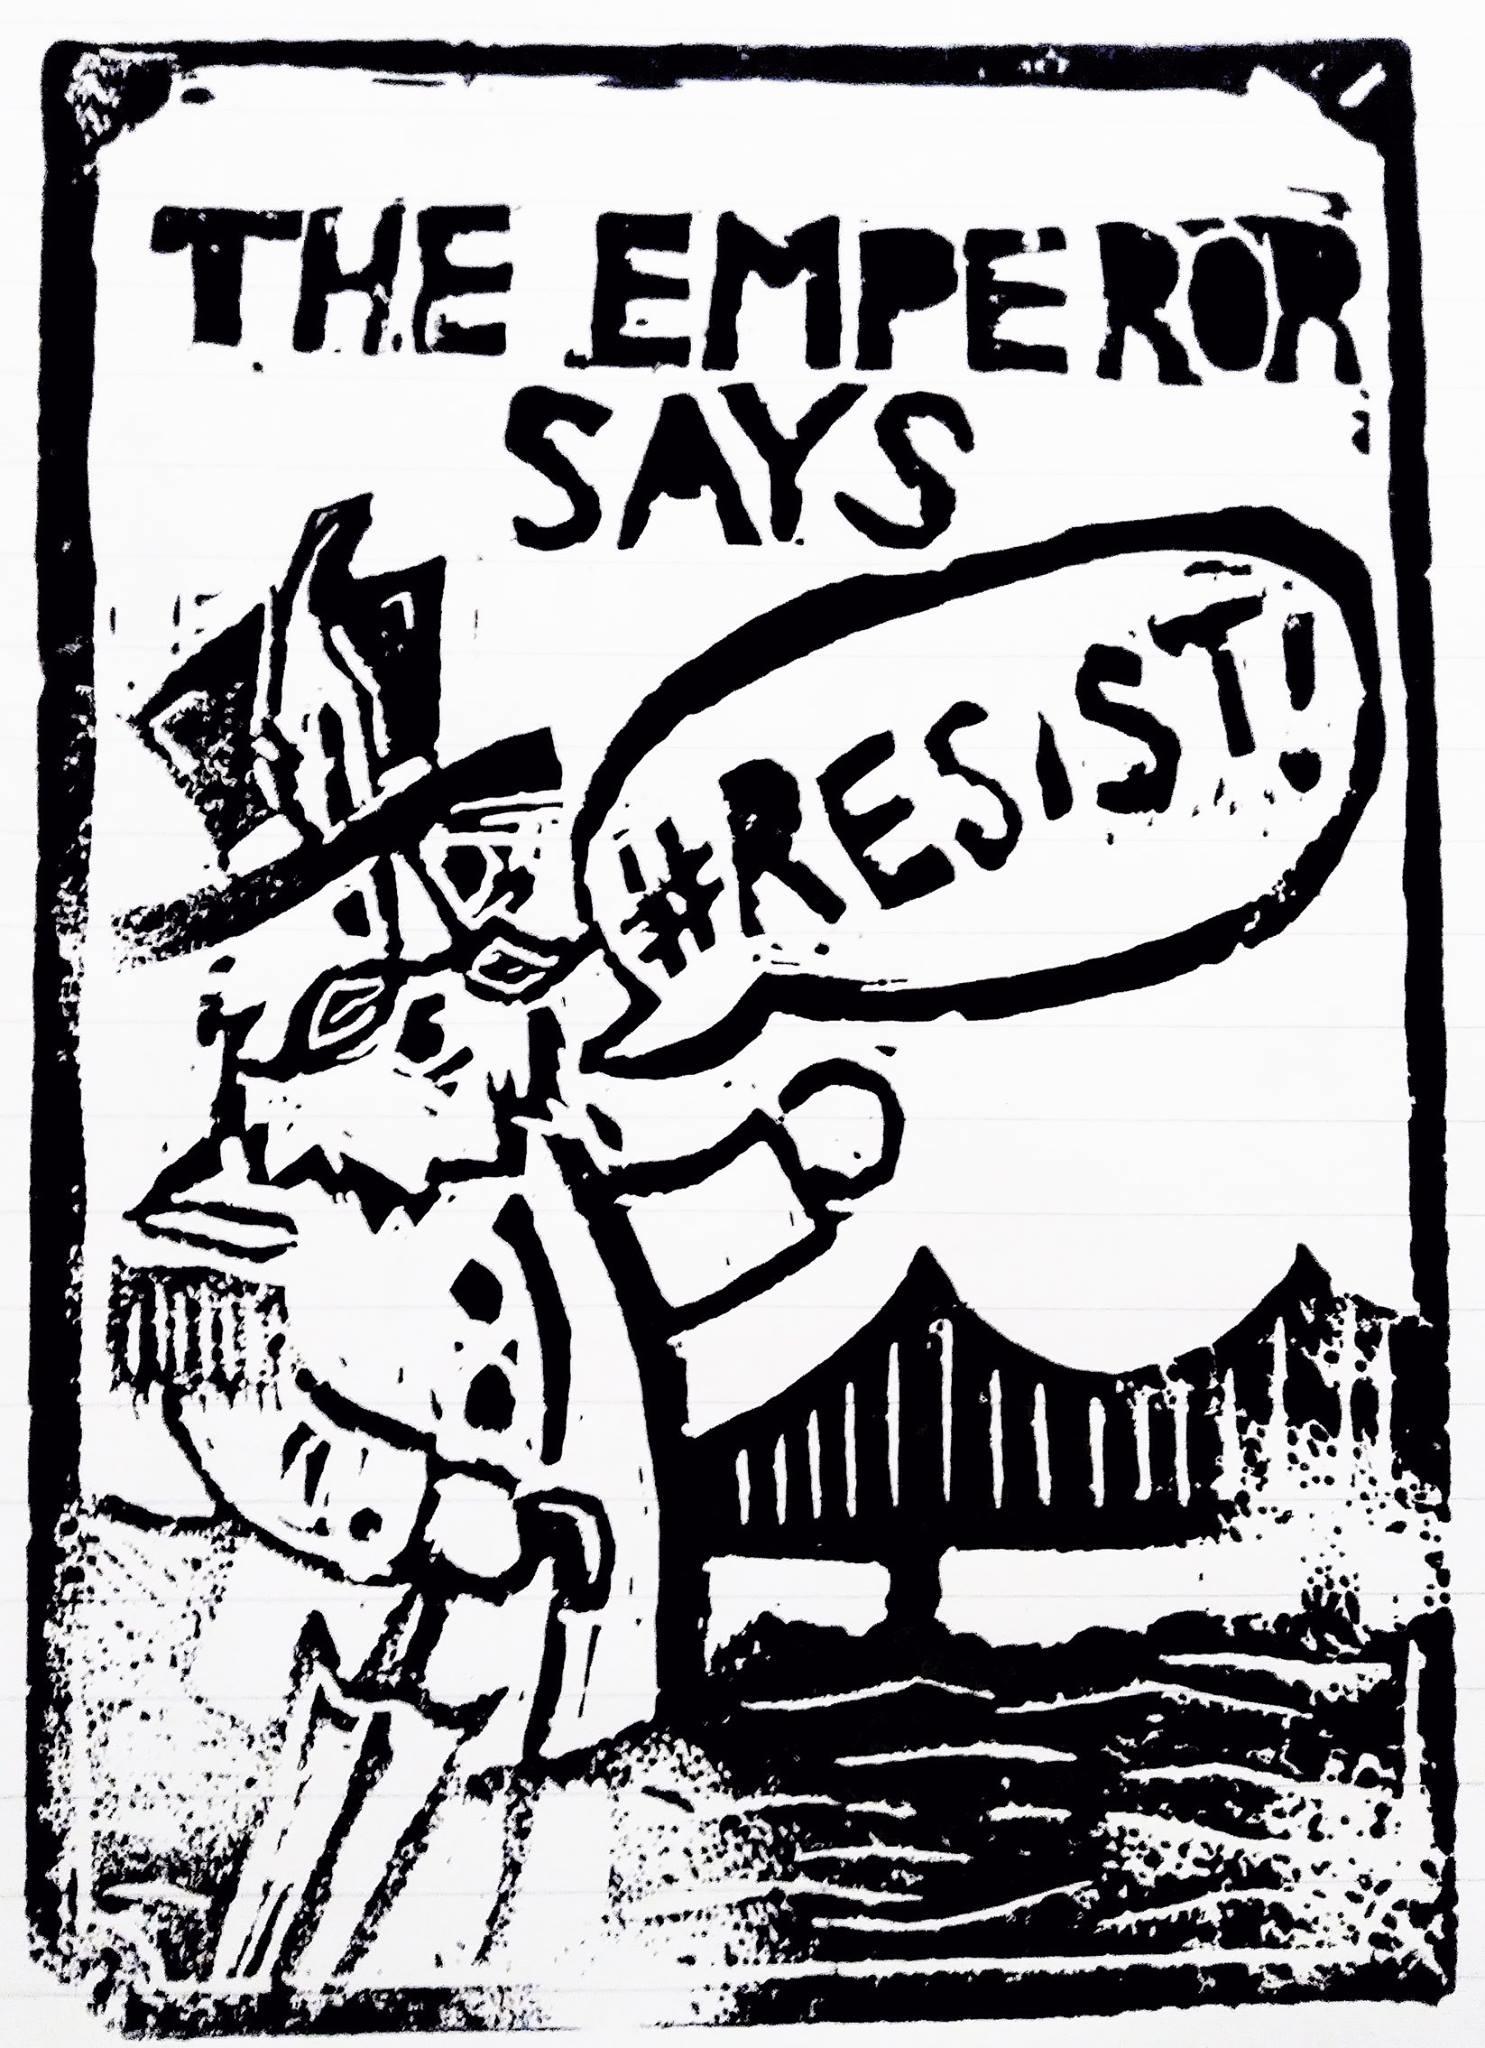 """#Resist,"" March 2017, by Aaron Almanza.  Linocut print. ©2017 Aaron Almanza. Source:  Aaron Almanza ."